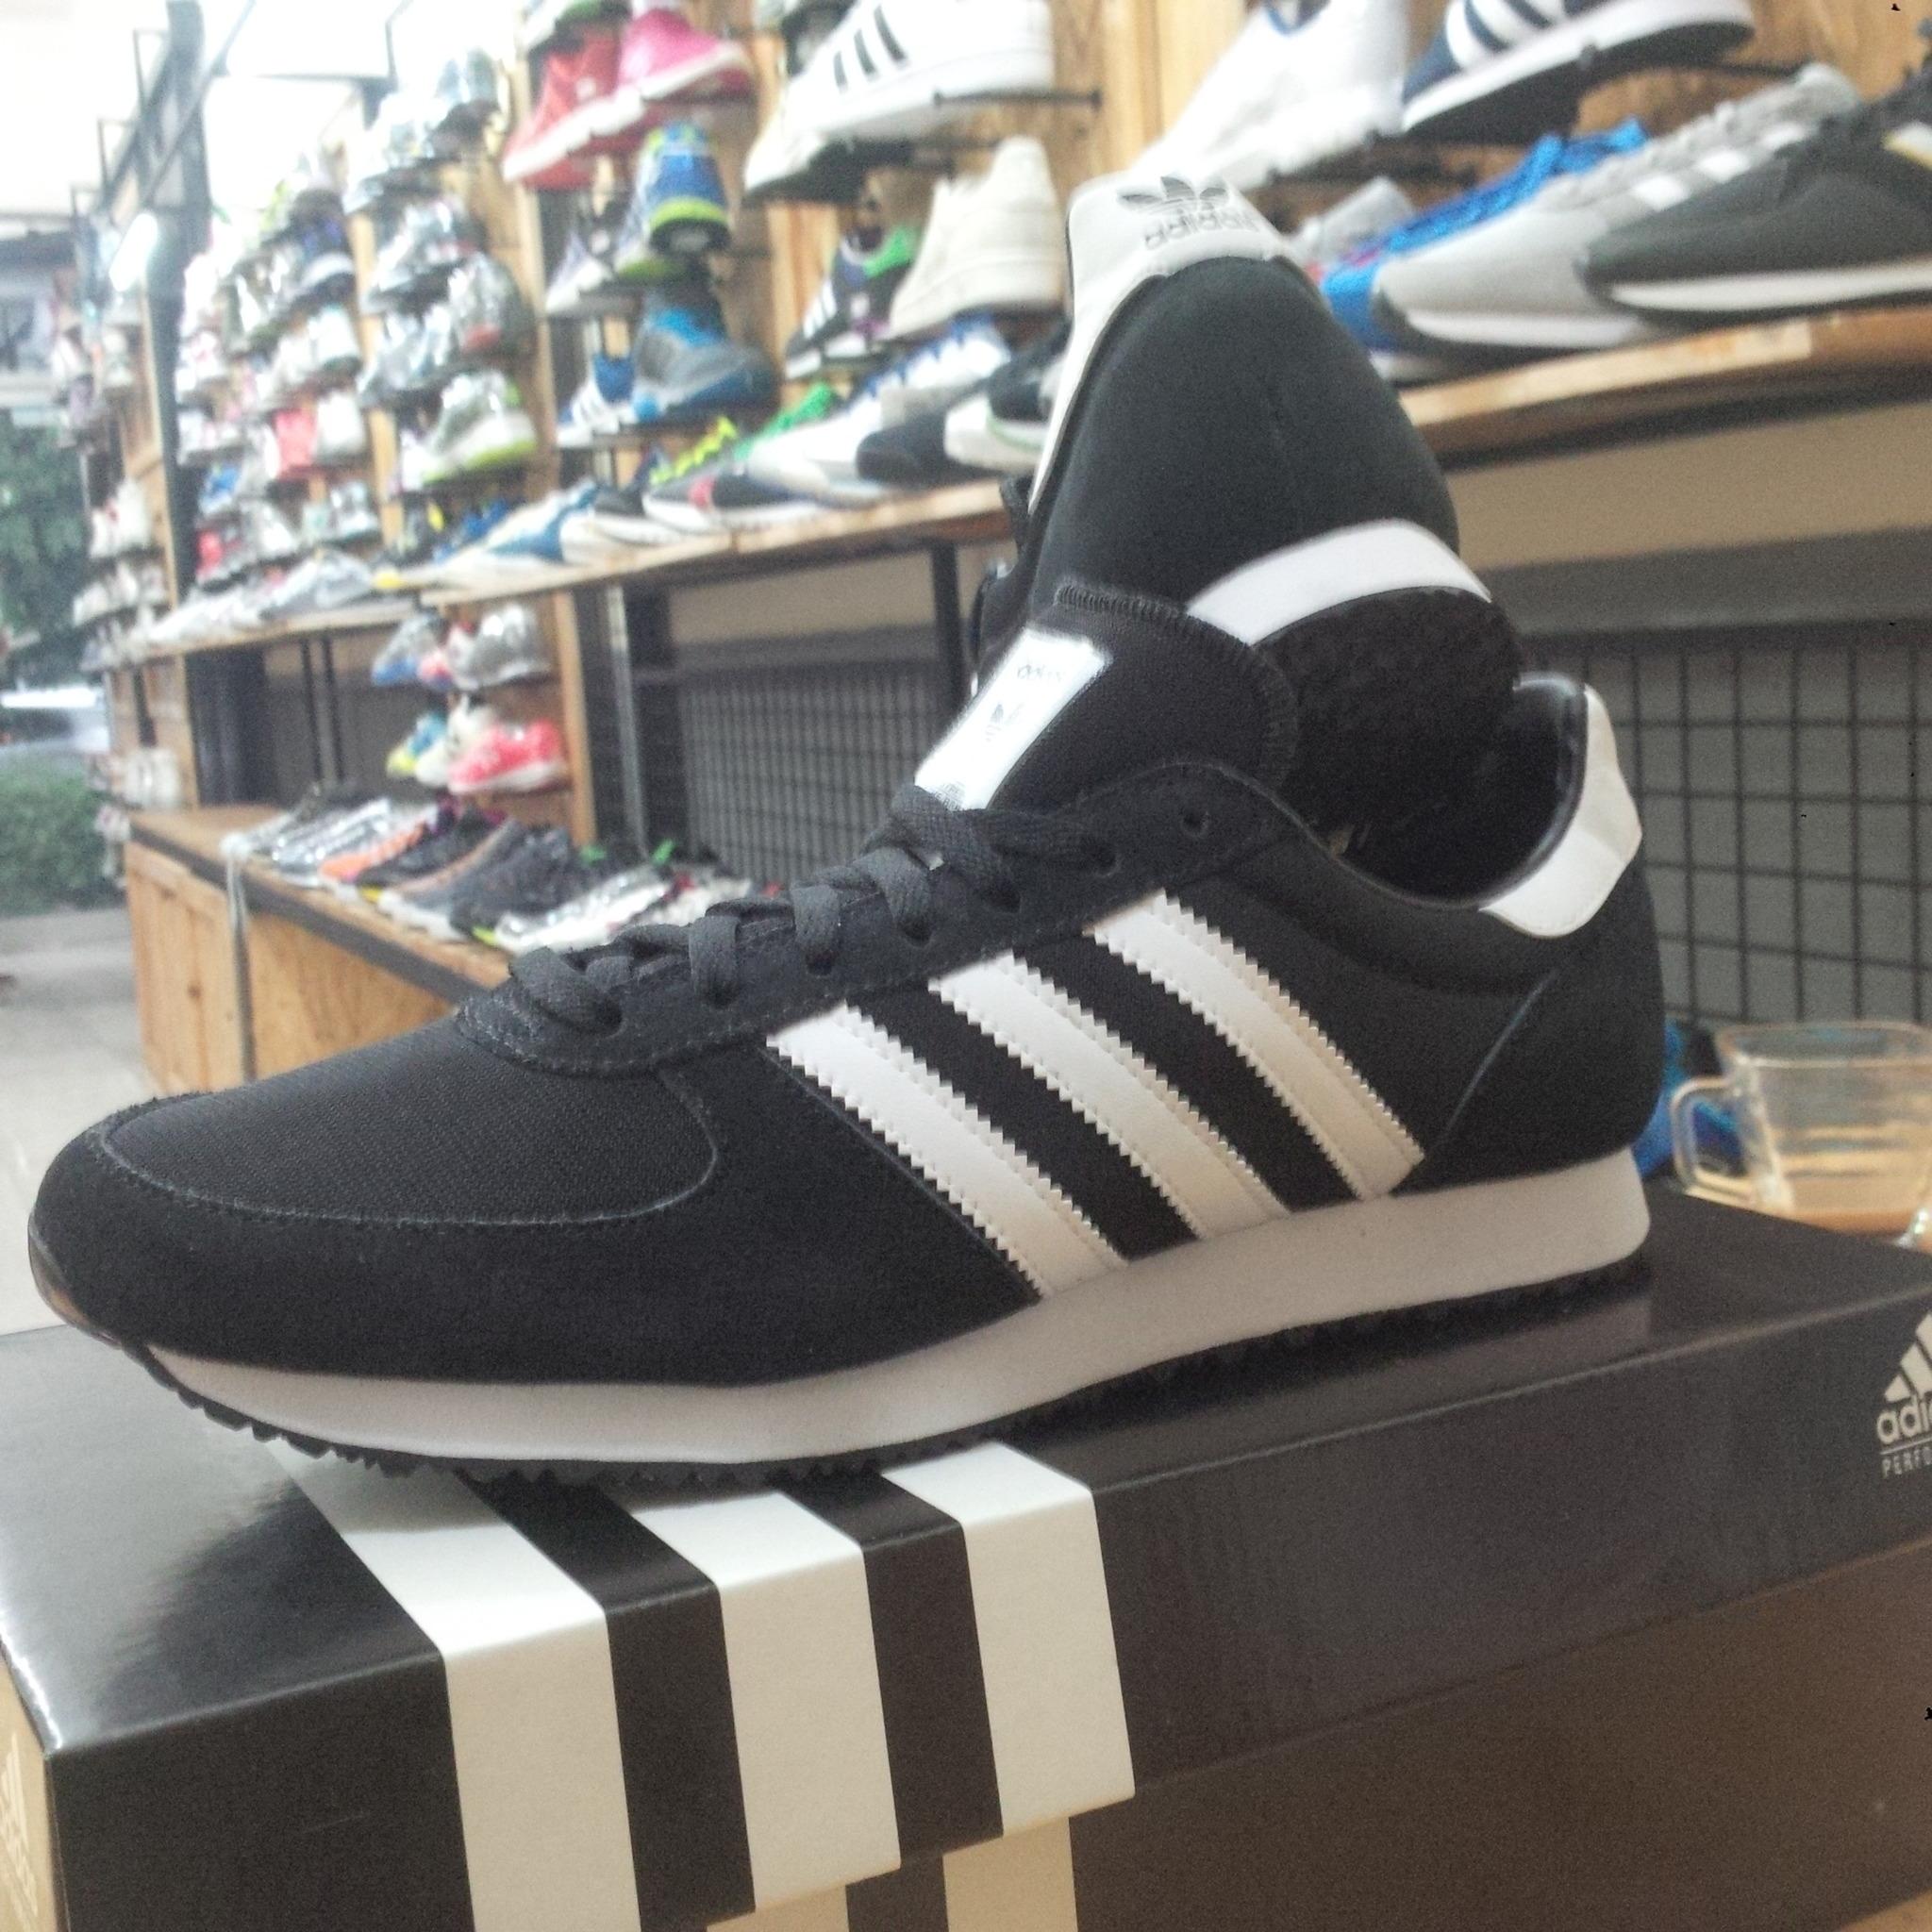 0a32af2d63bc5 ... best price sepatu adidas zx racer original . e78b1 0a7d3